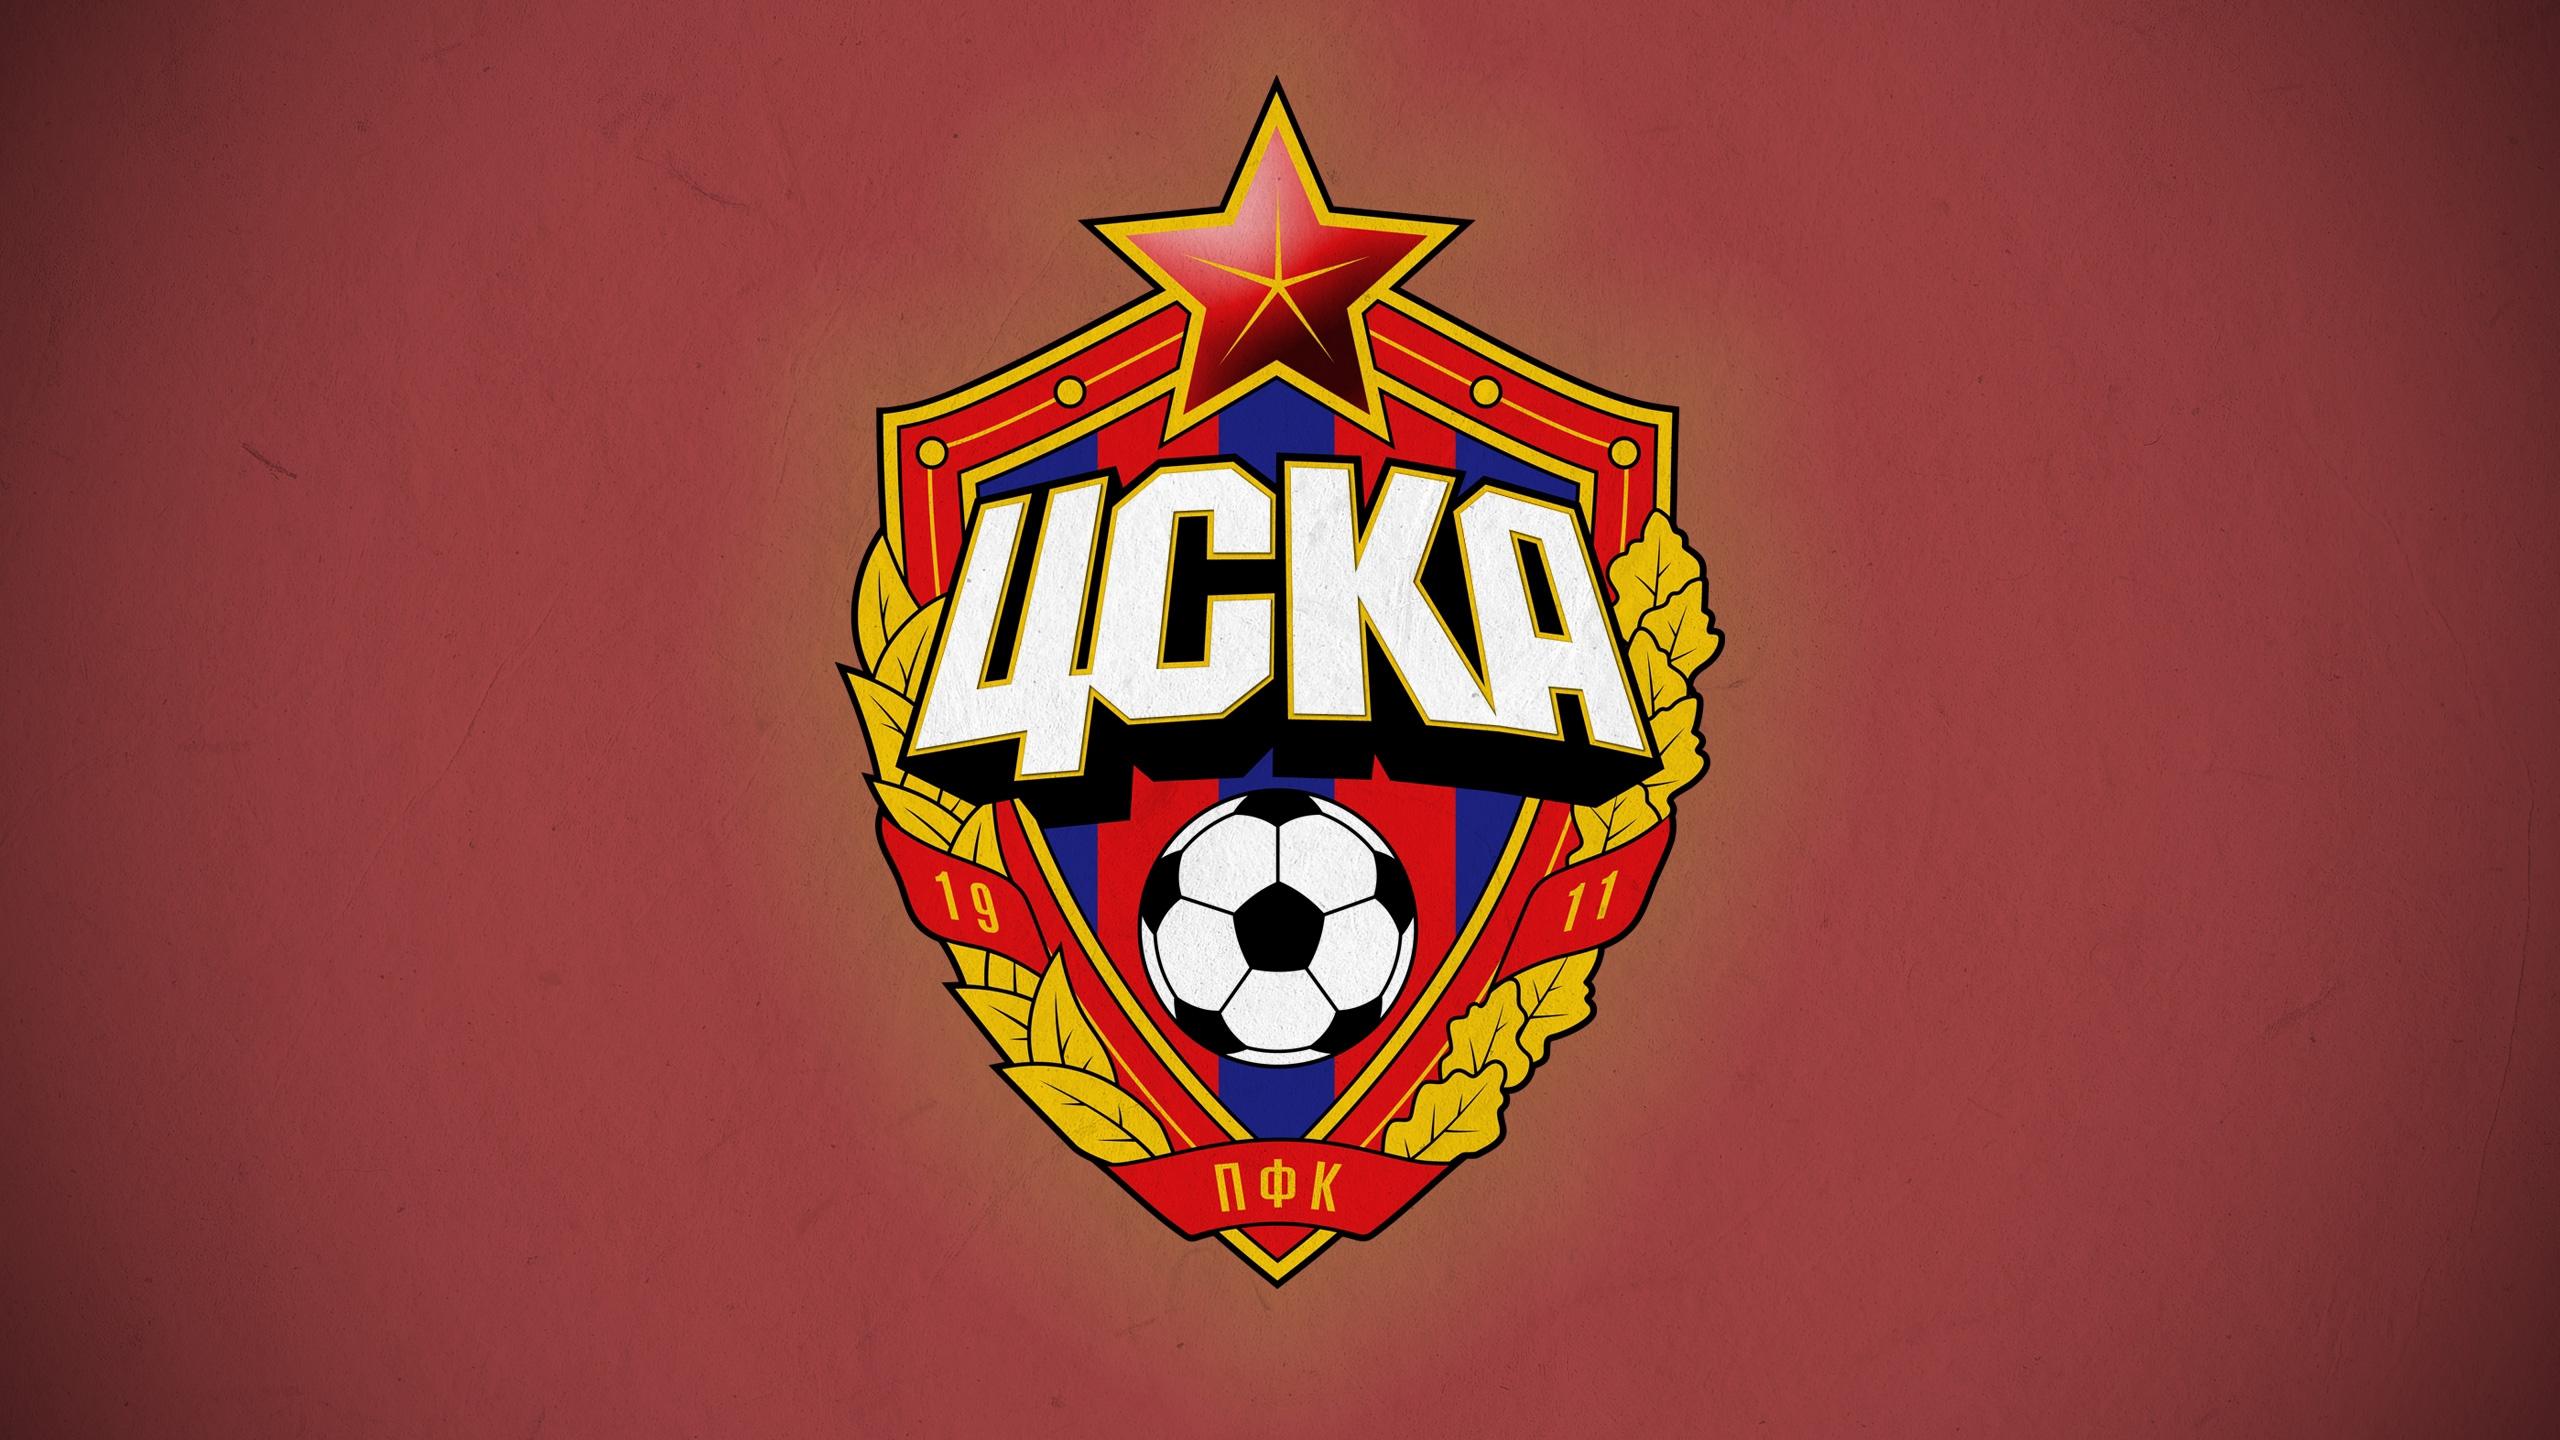 Cska Emblem Ball Football   Stock Photos Images HD 2560x1440